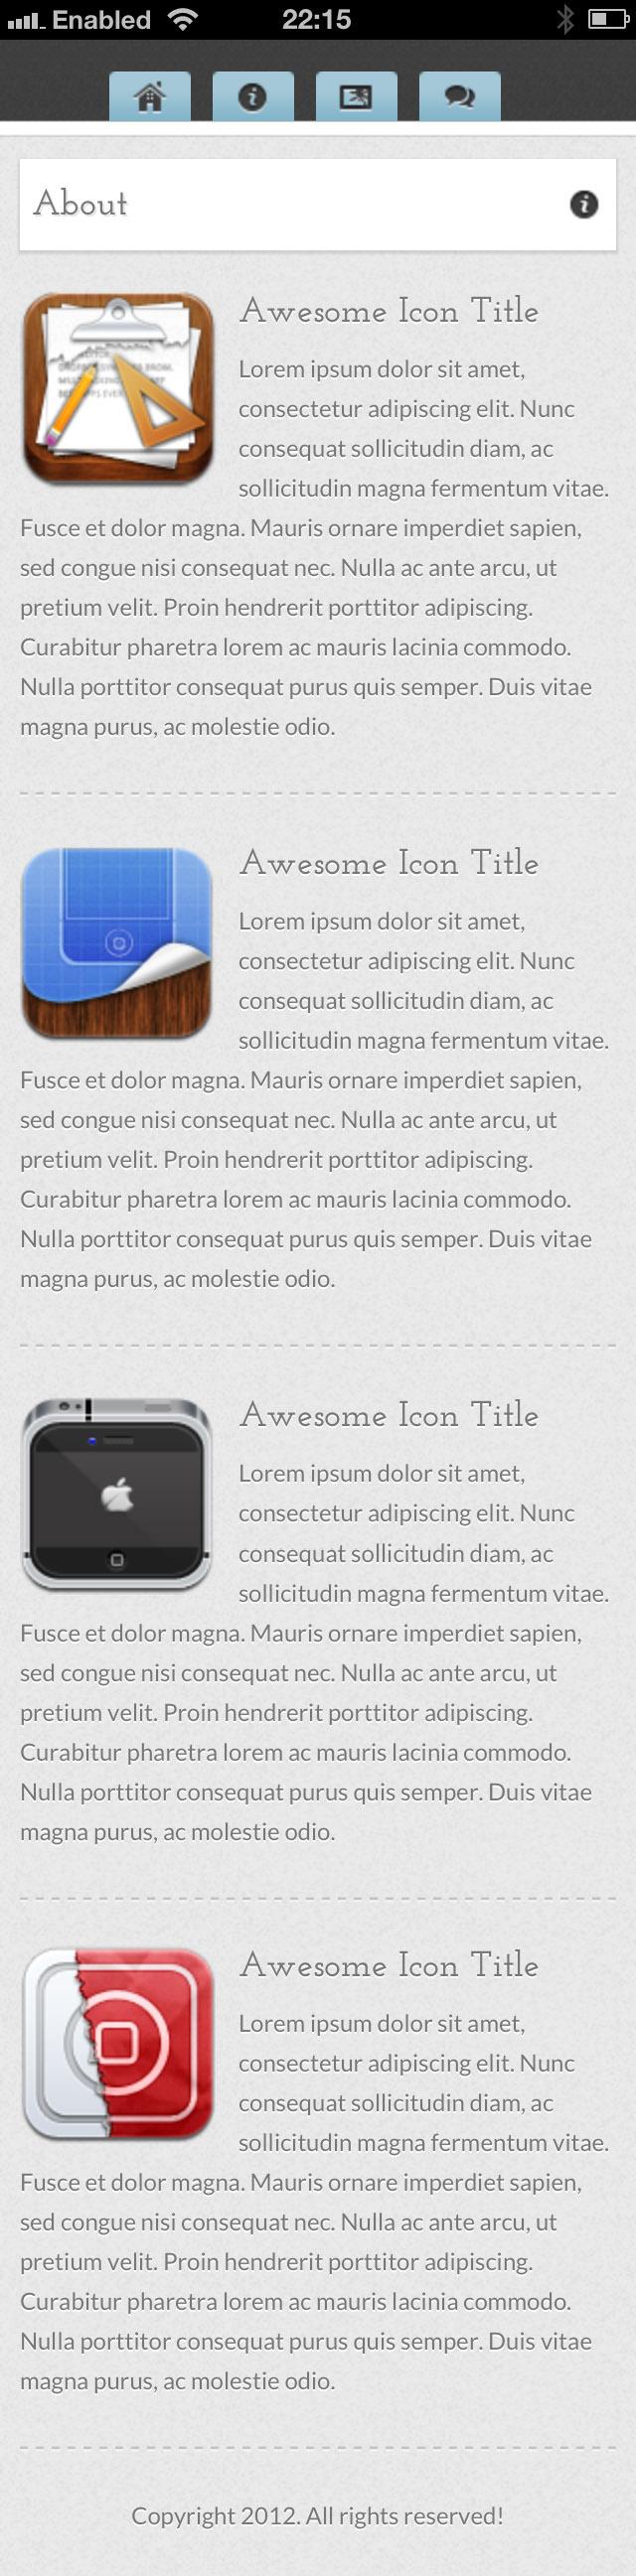 Worktropia | Unique HTML5 CSS3 Folio & iPhone Page